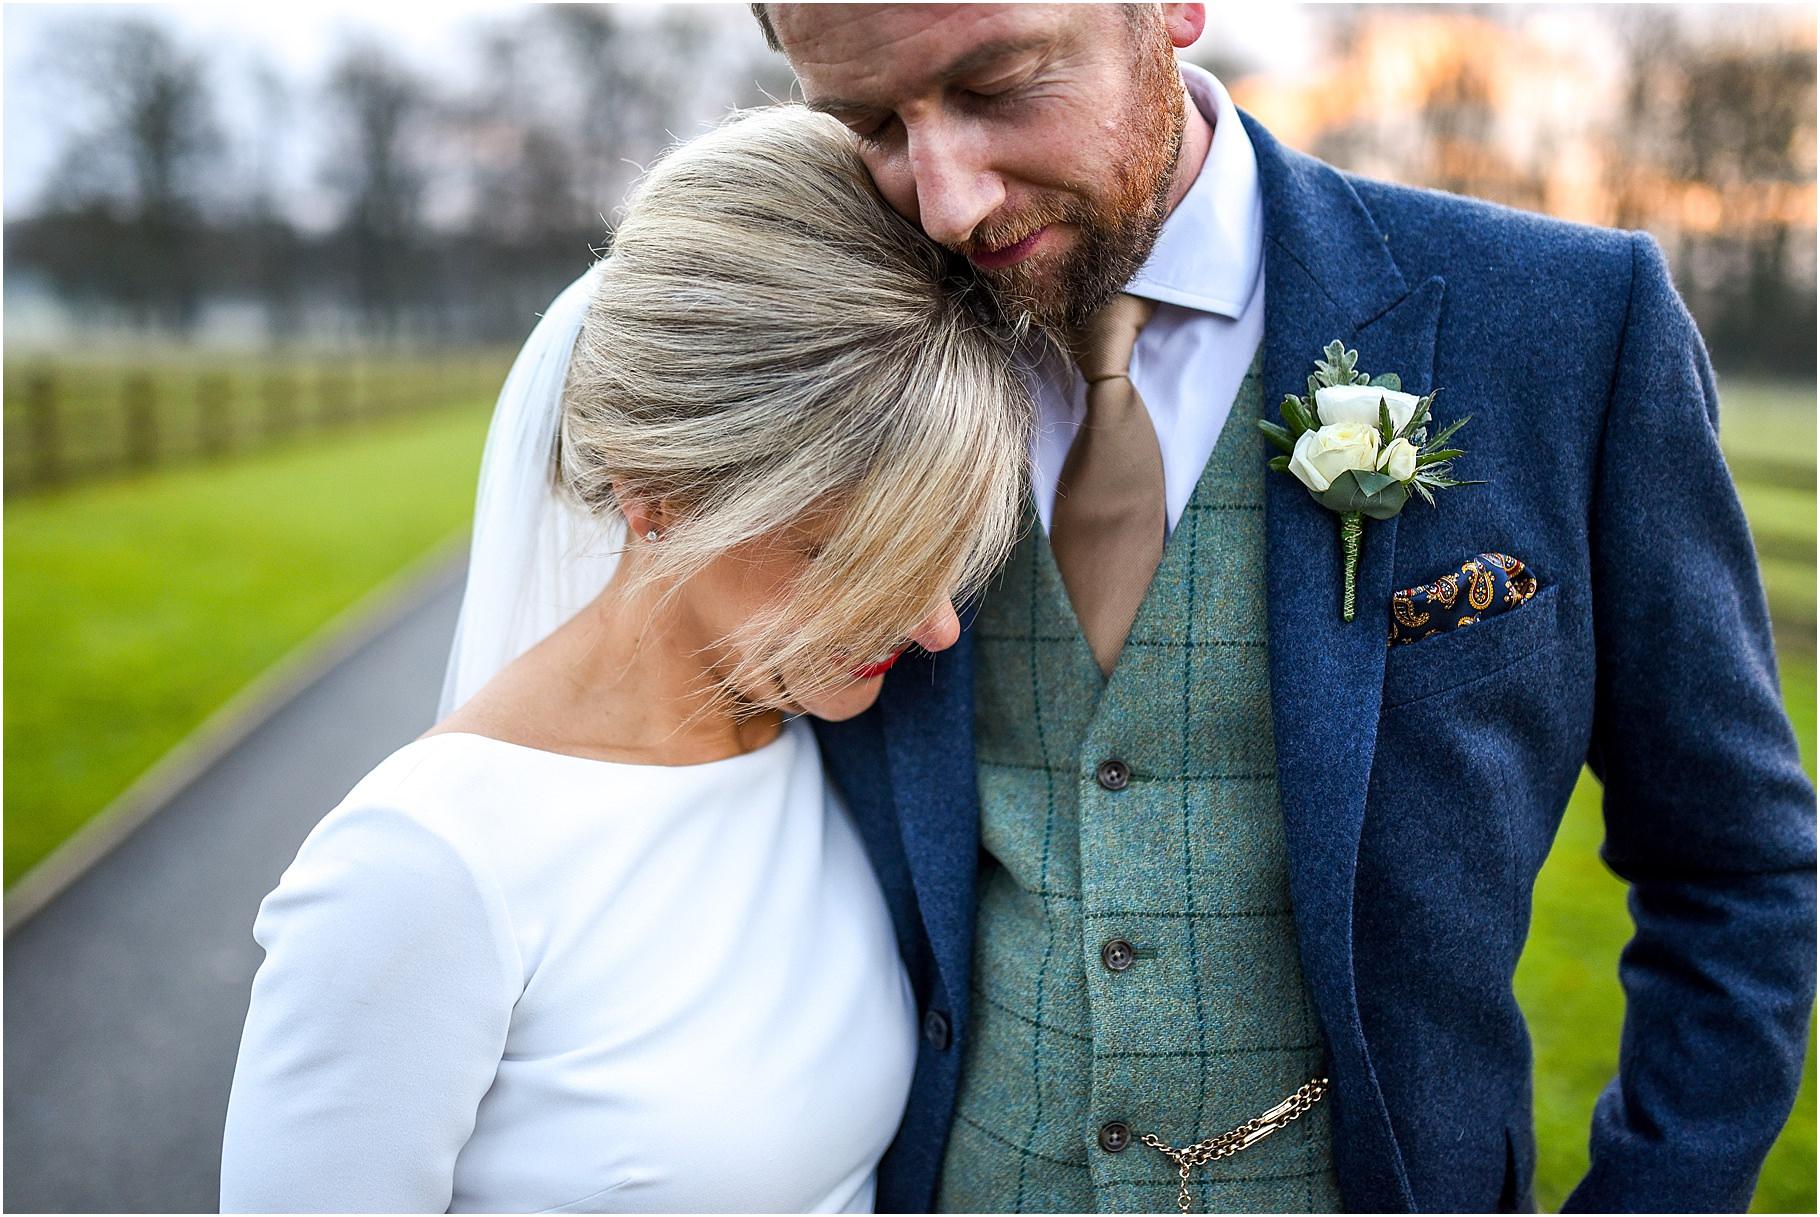 dan-wootton-photography-2017-weddings-059.jpg